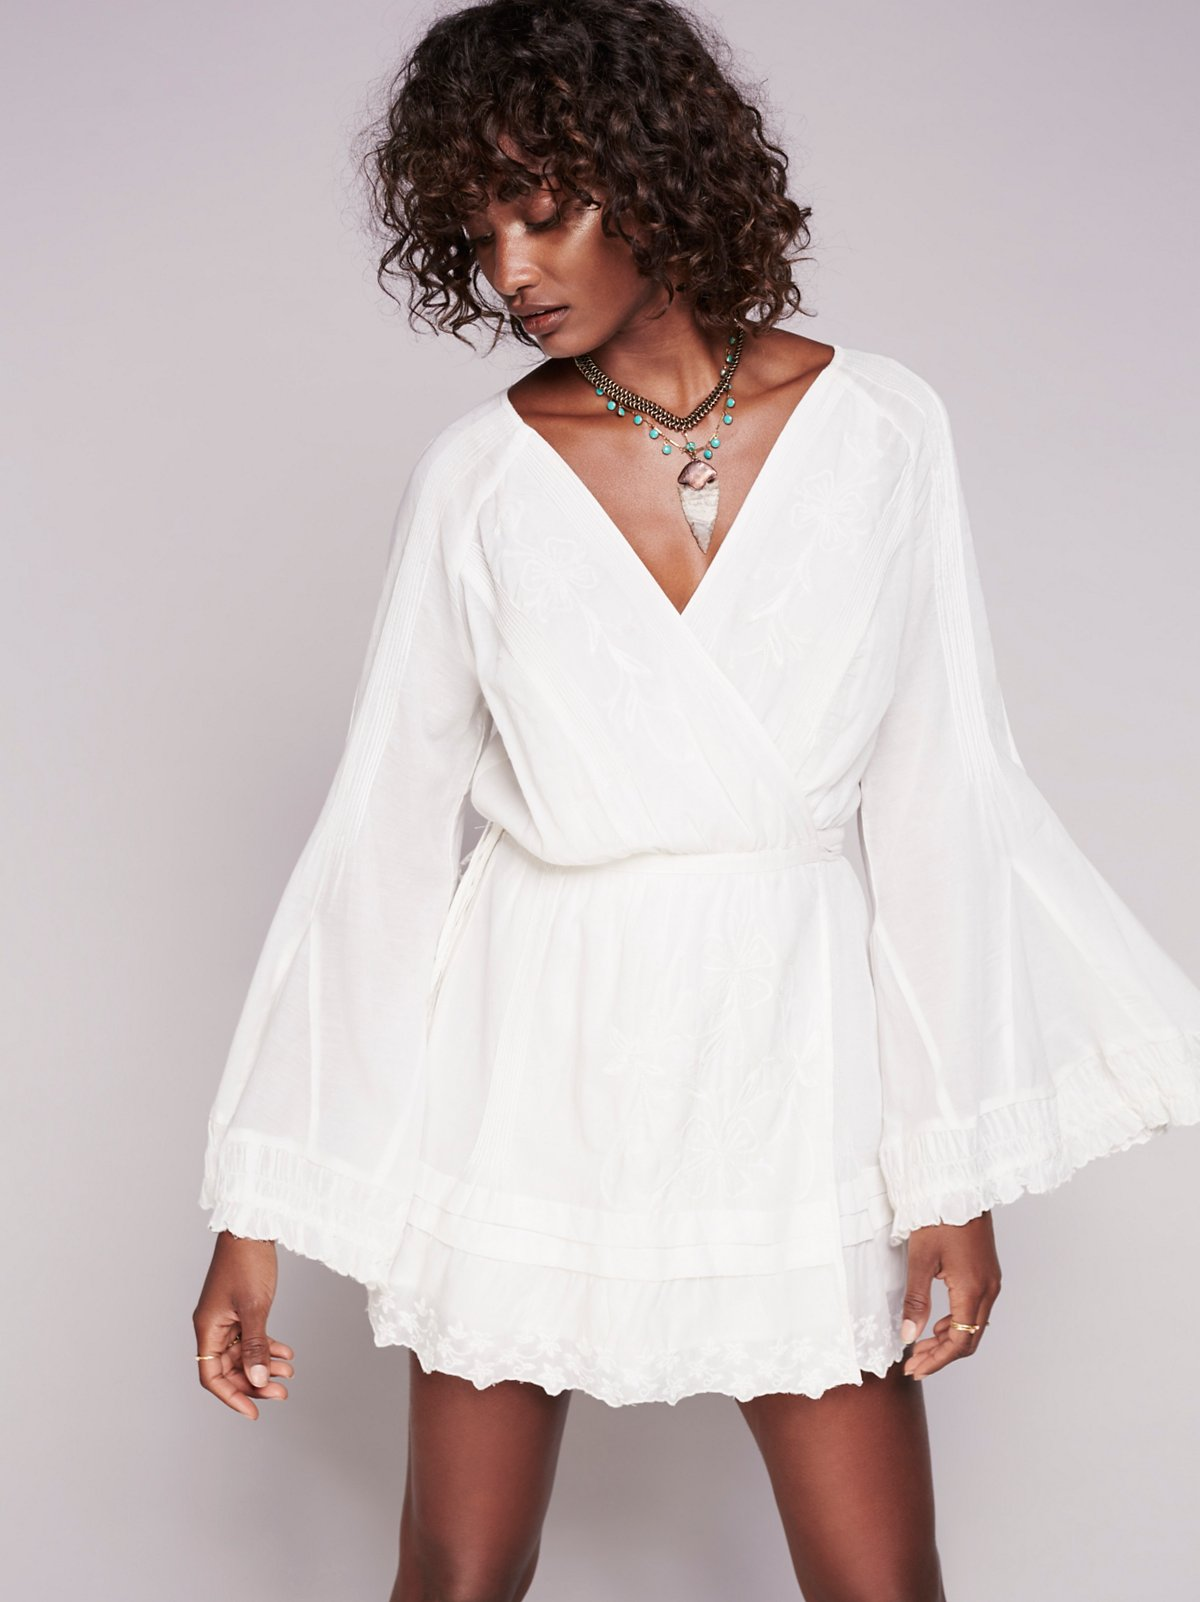 That's My Desire Dress